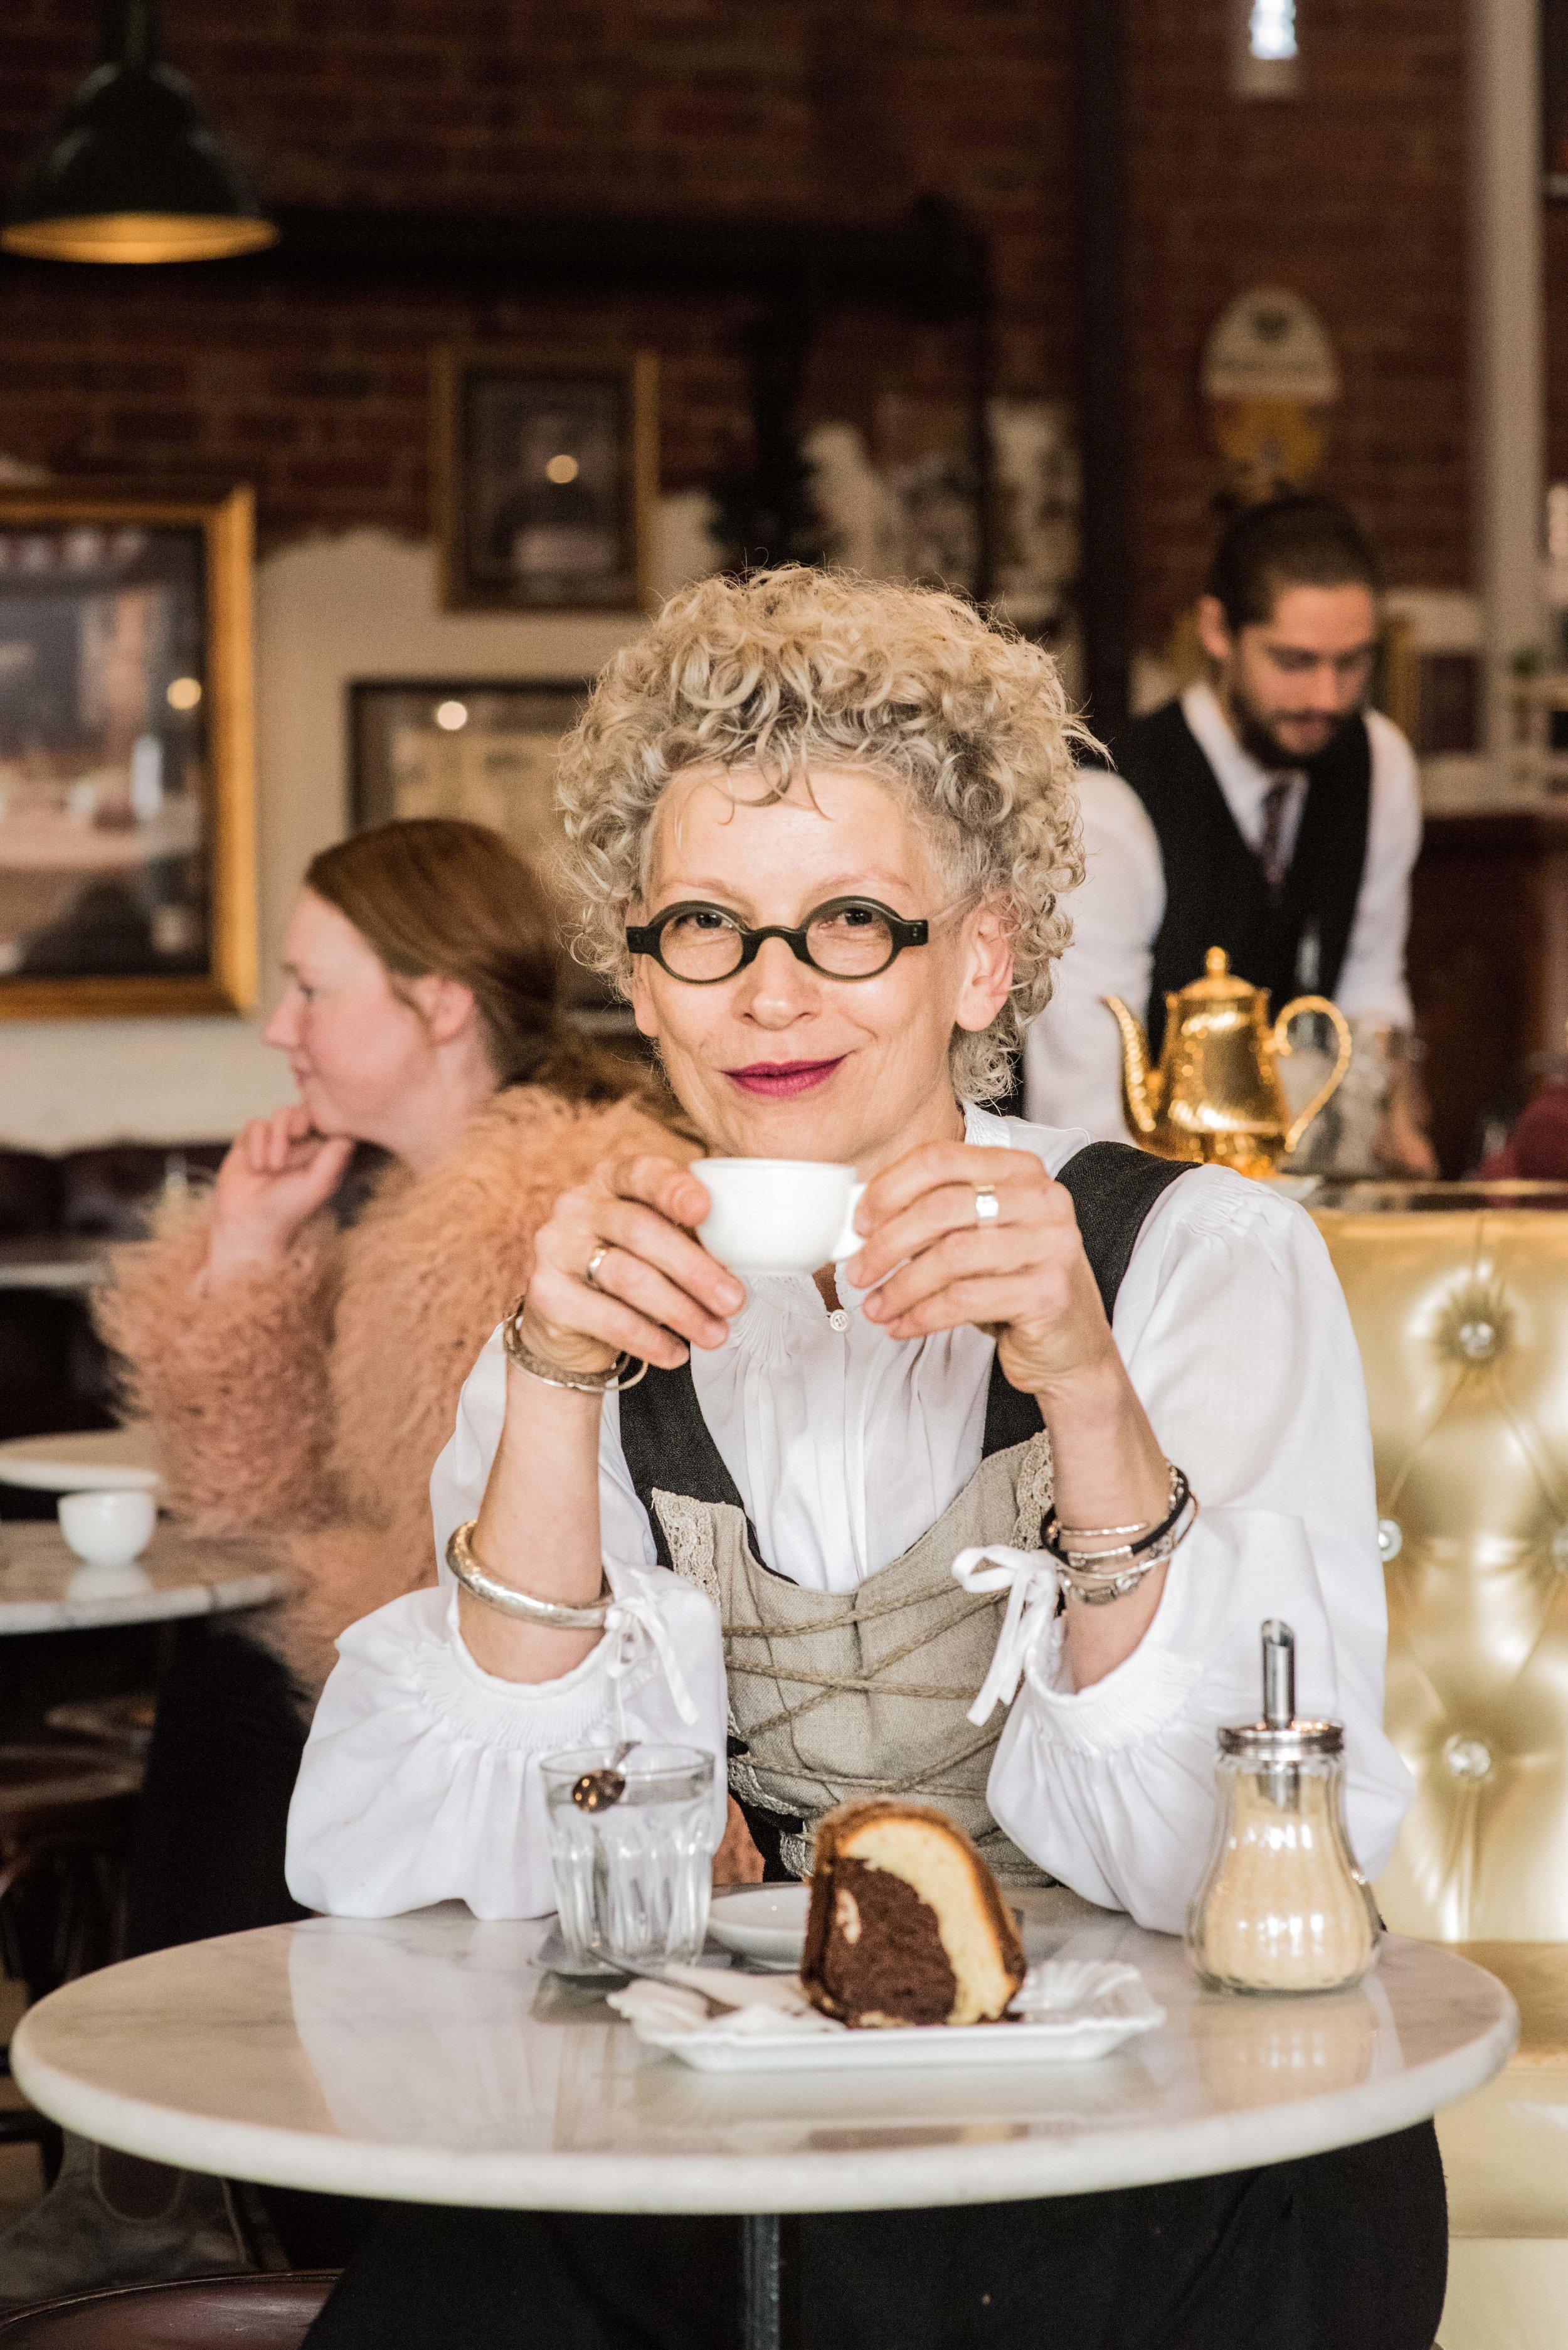 Elna Schaerf Trauner  Das Kaffeehause, Castlemaine. Copyright Richard Cornish 2019. Single use only. Credit Richard Cornish. -2.jpg